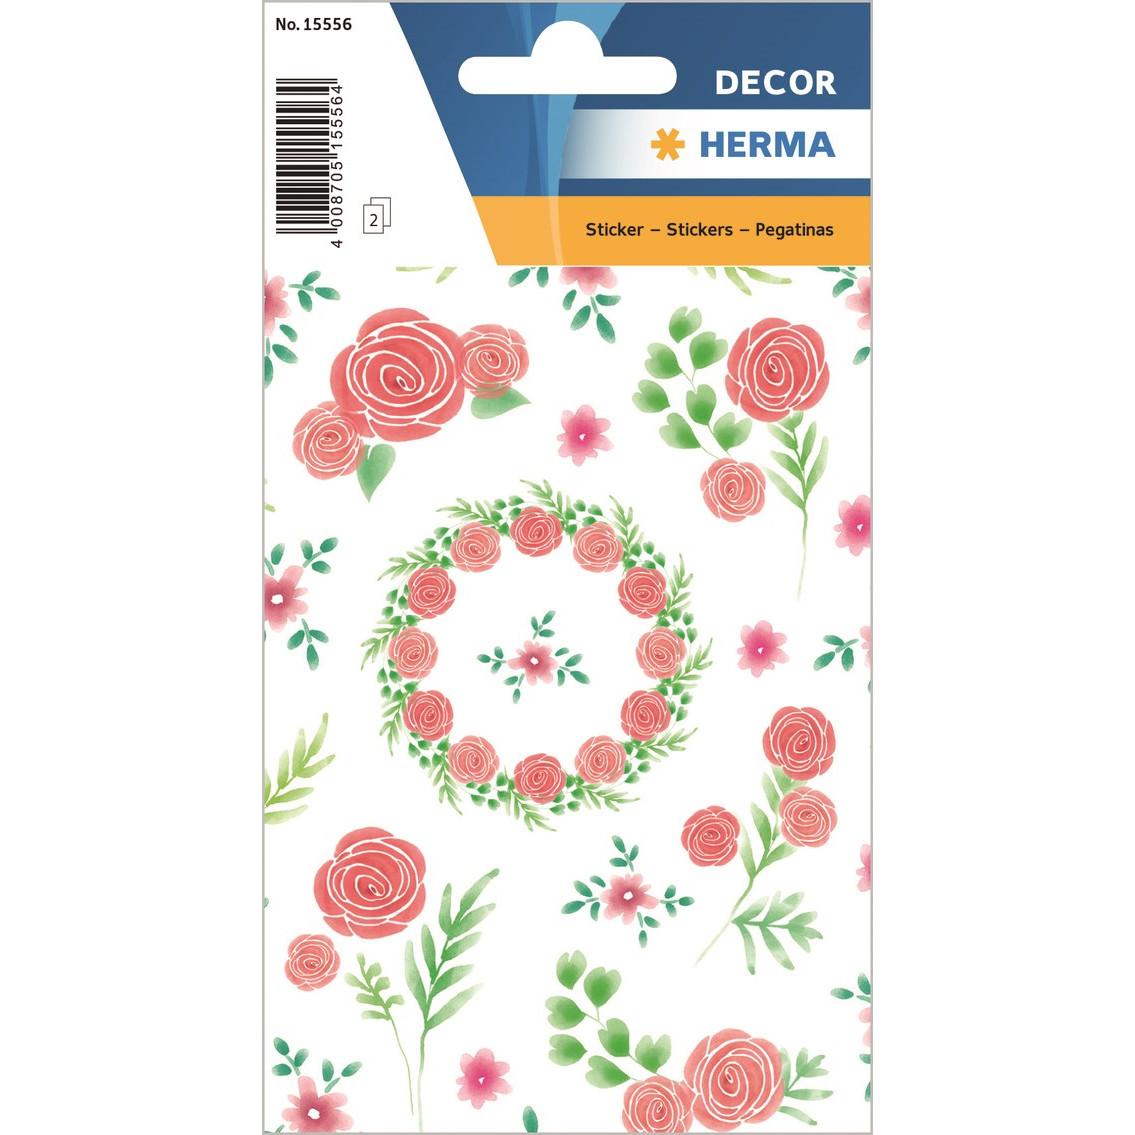 HERMA Herma stickers Decor smukke roser (2)